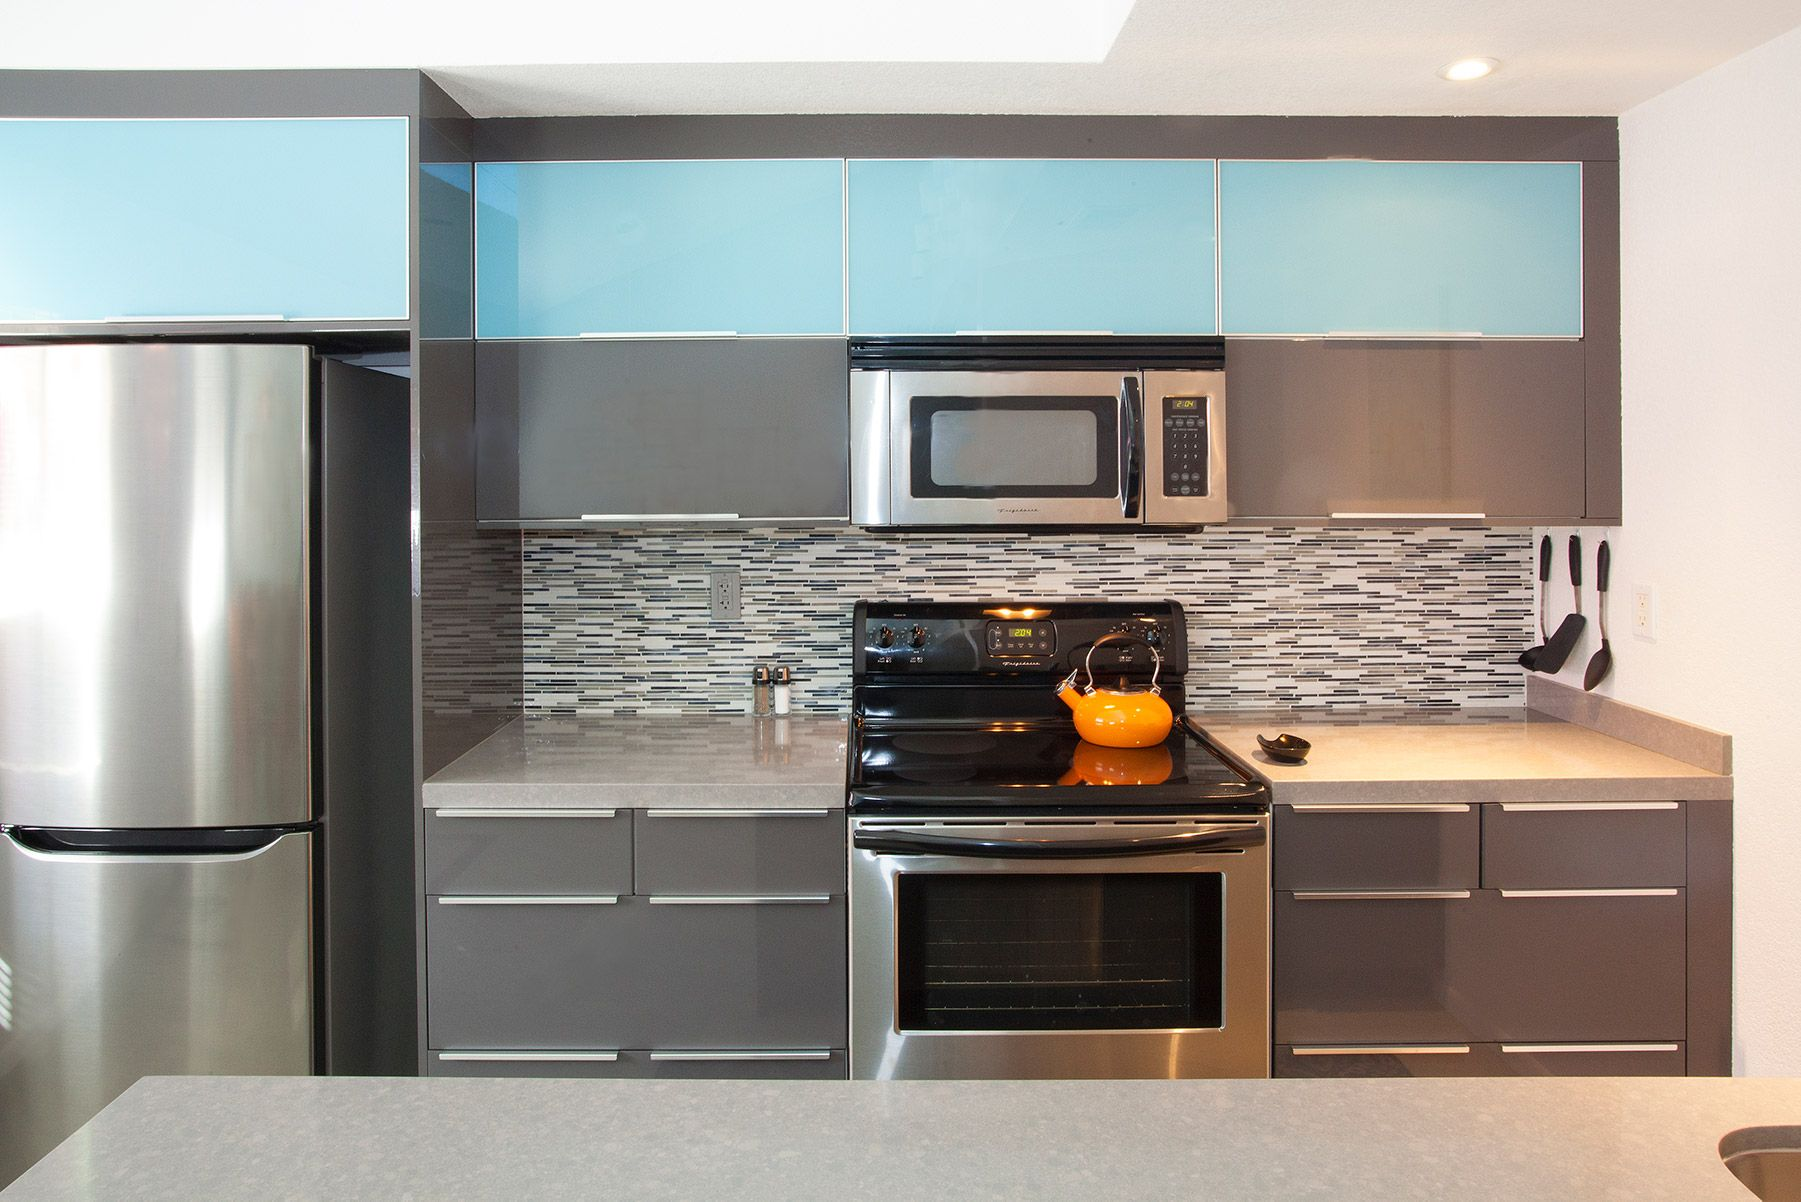 Kitchens & Dining 24.jpg